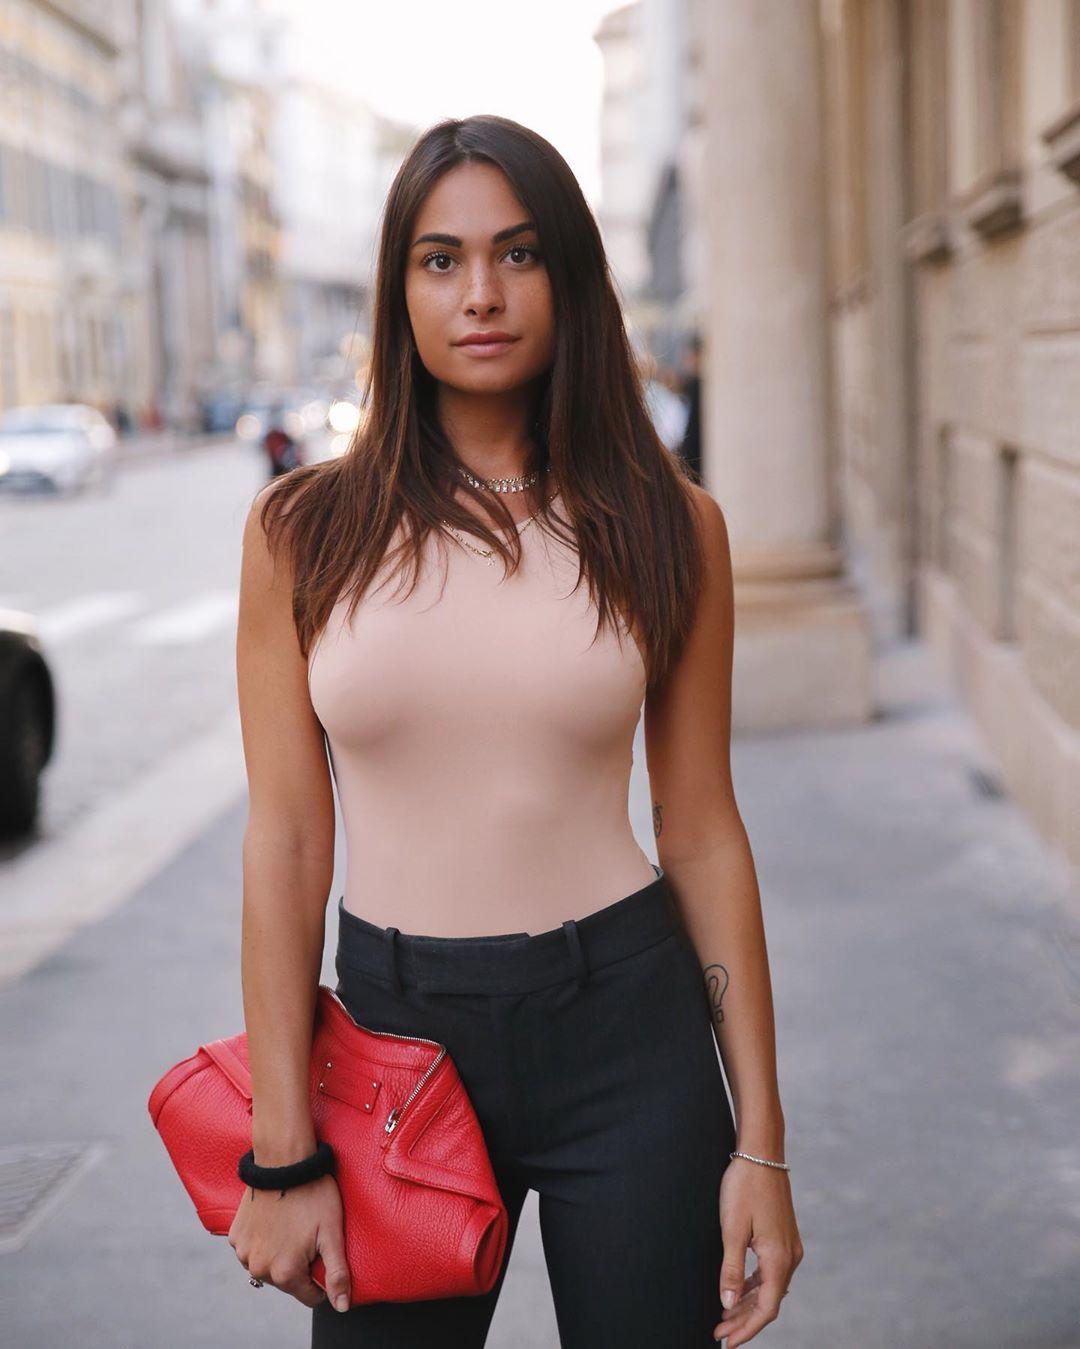 Vittoria Deganello